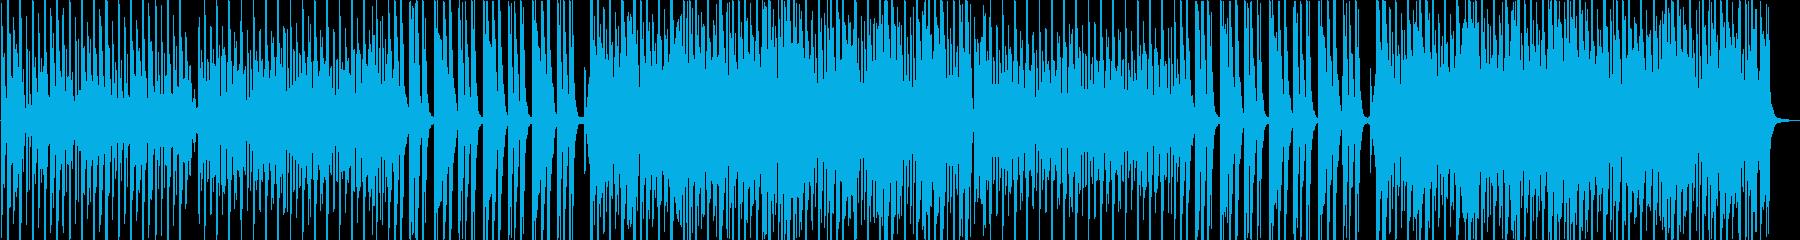 80sハッピーなディスコダンストラック♬の再生済みの波形